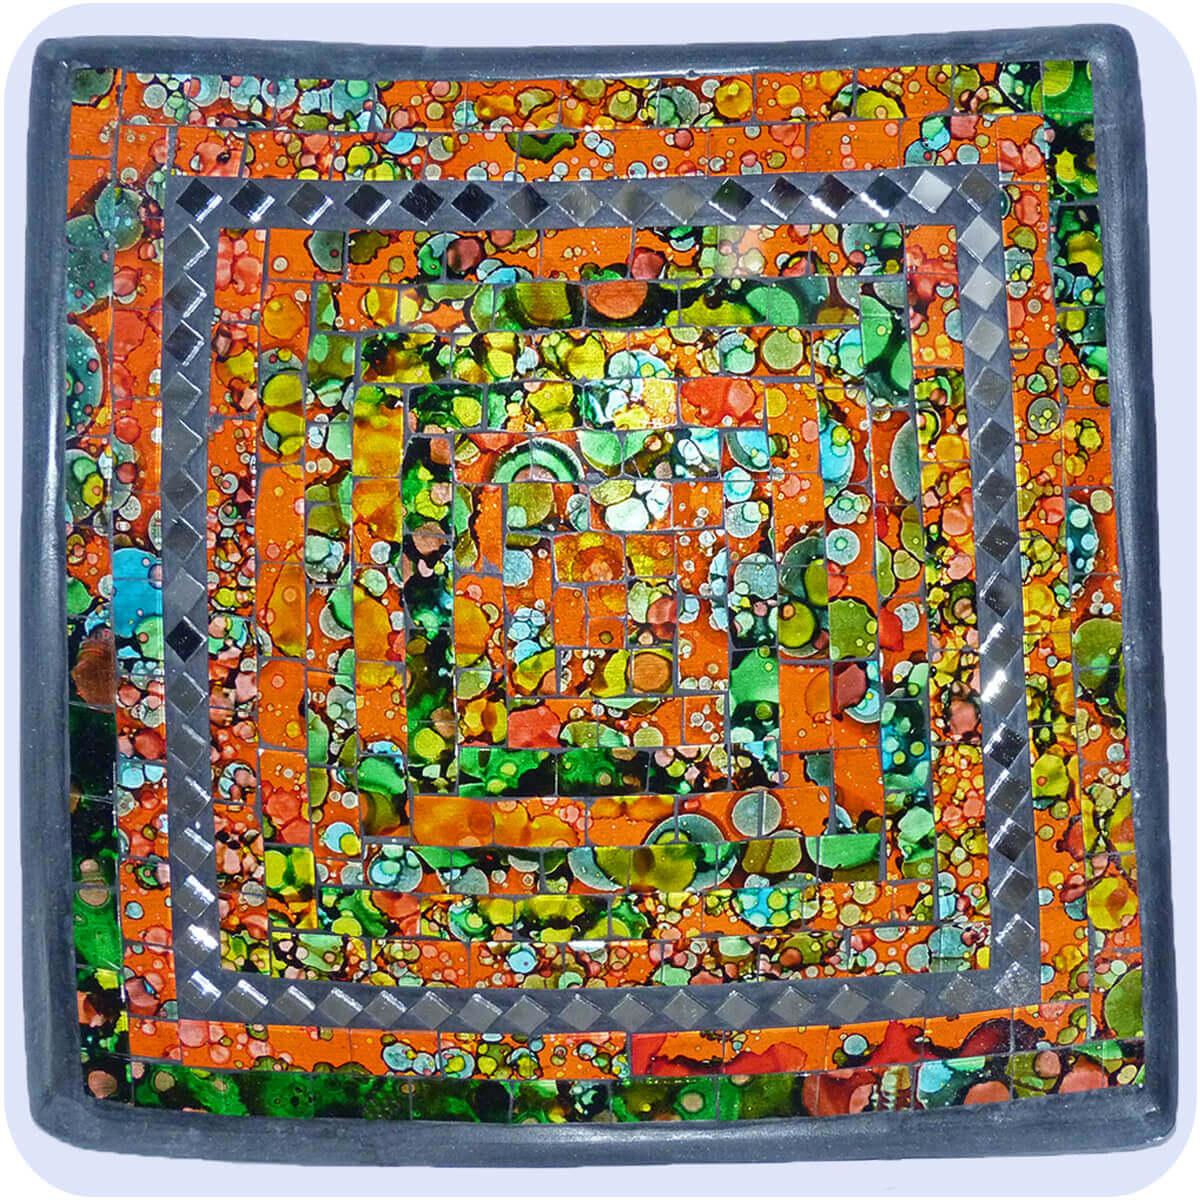 mosaikschale tonschale glasschale deko schale mosaik quadrat spiegel. Black Bedroom Furniture Sets. Home Design Ideas